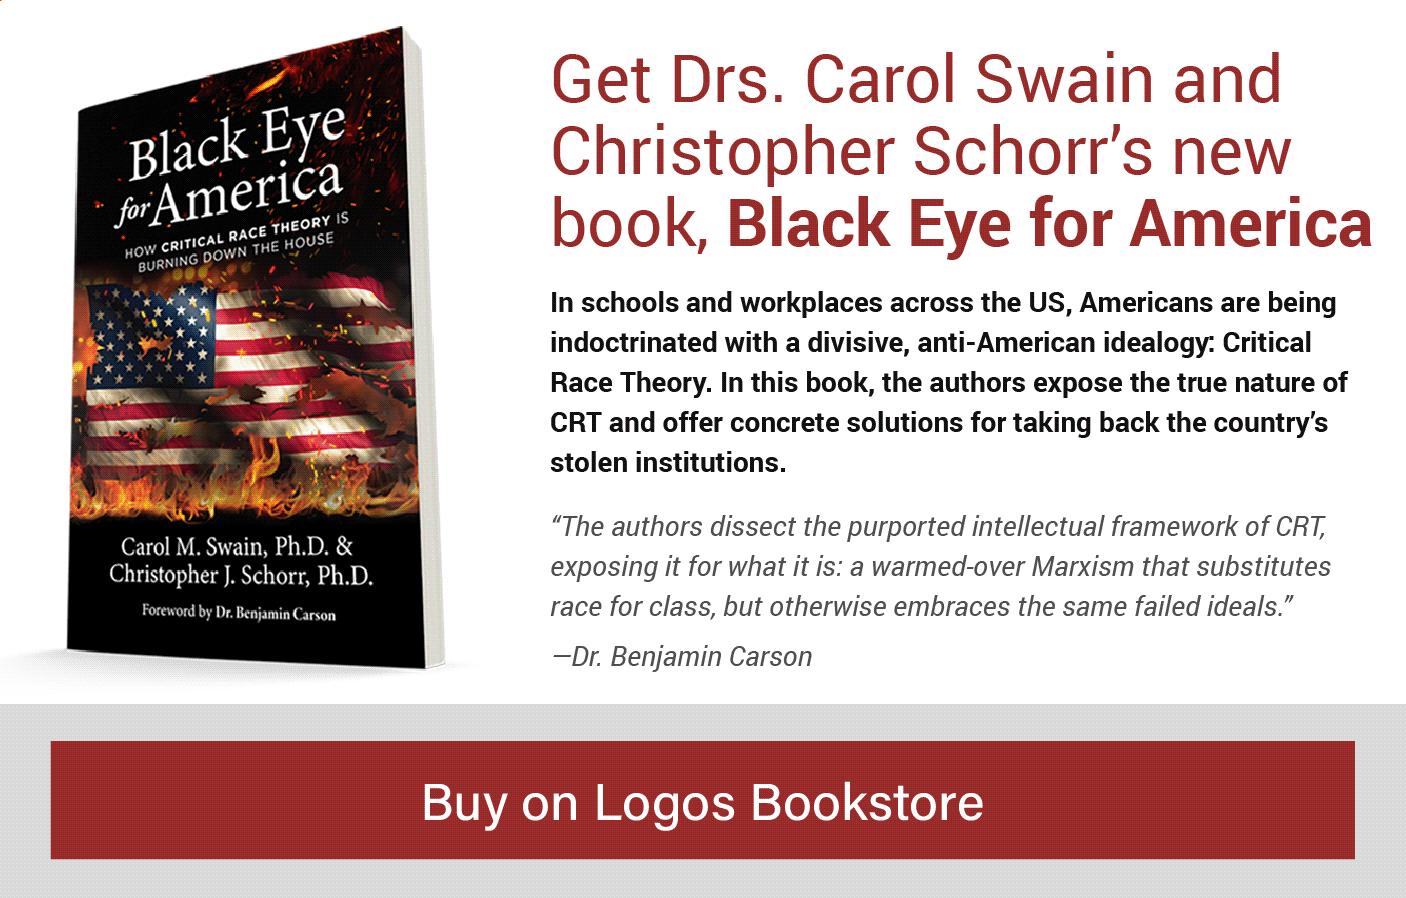 Black Eye for America Buy on Logos Bookstore popup